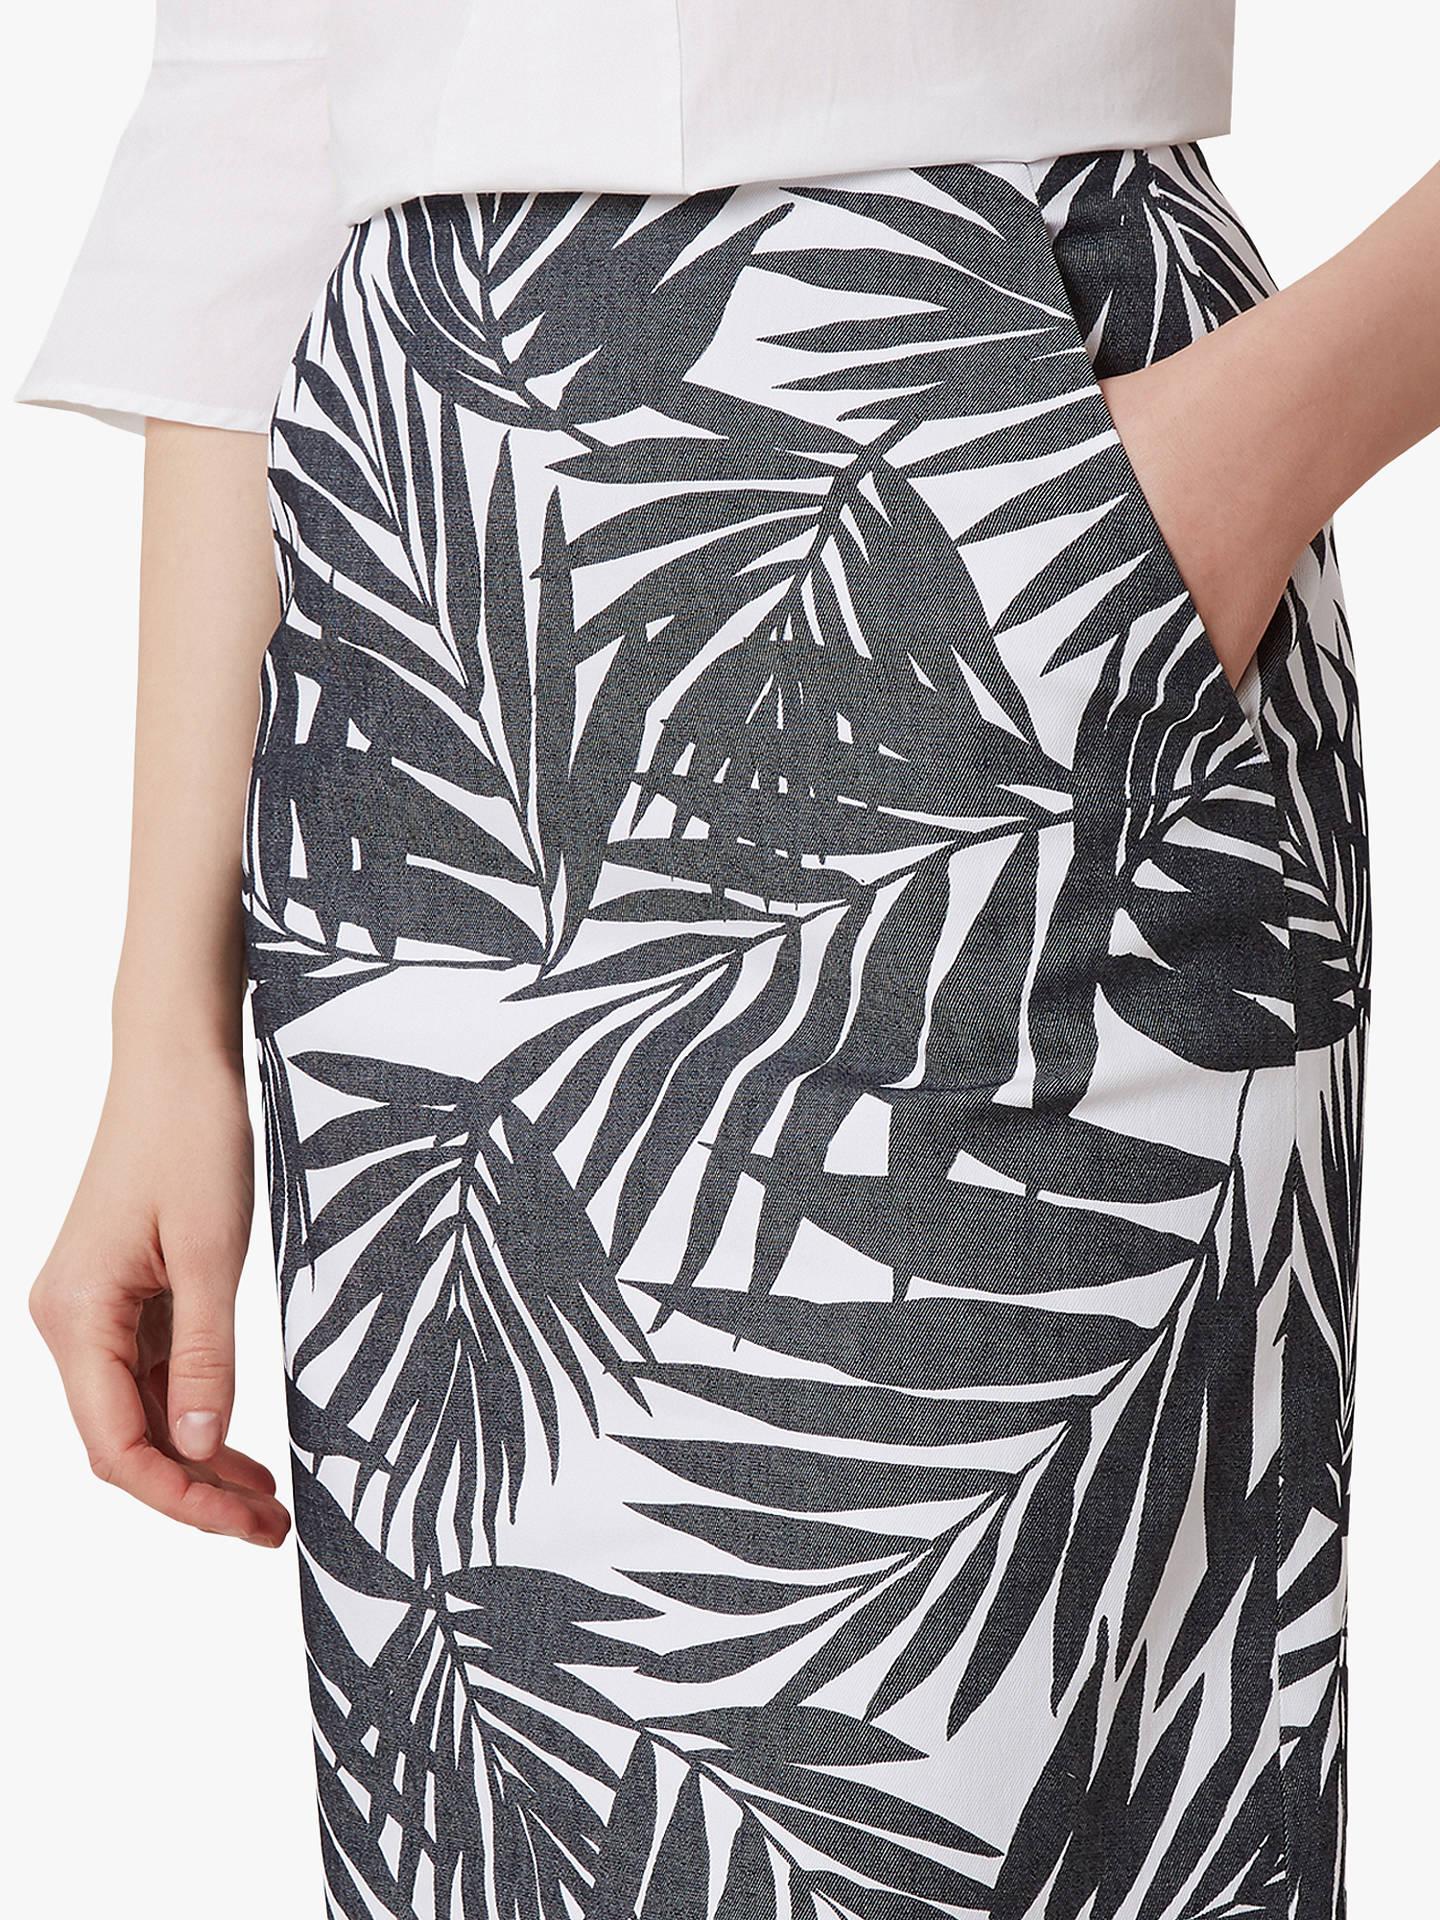 4828efc1ad Buy Hobbs Loretta Leaf Print Skirt, Navy/White, 6 Online at johnlewis.